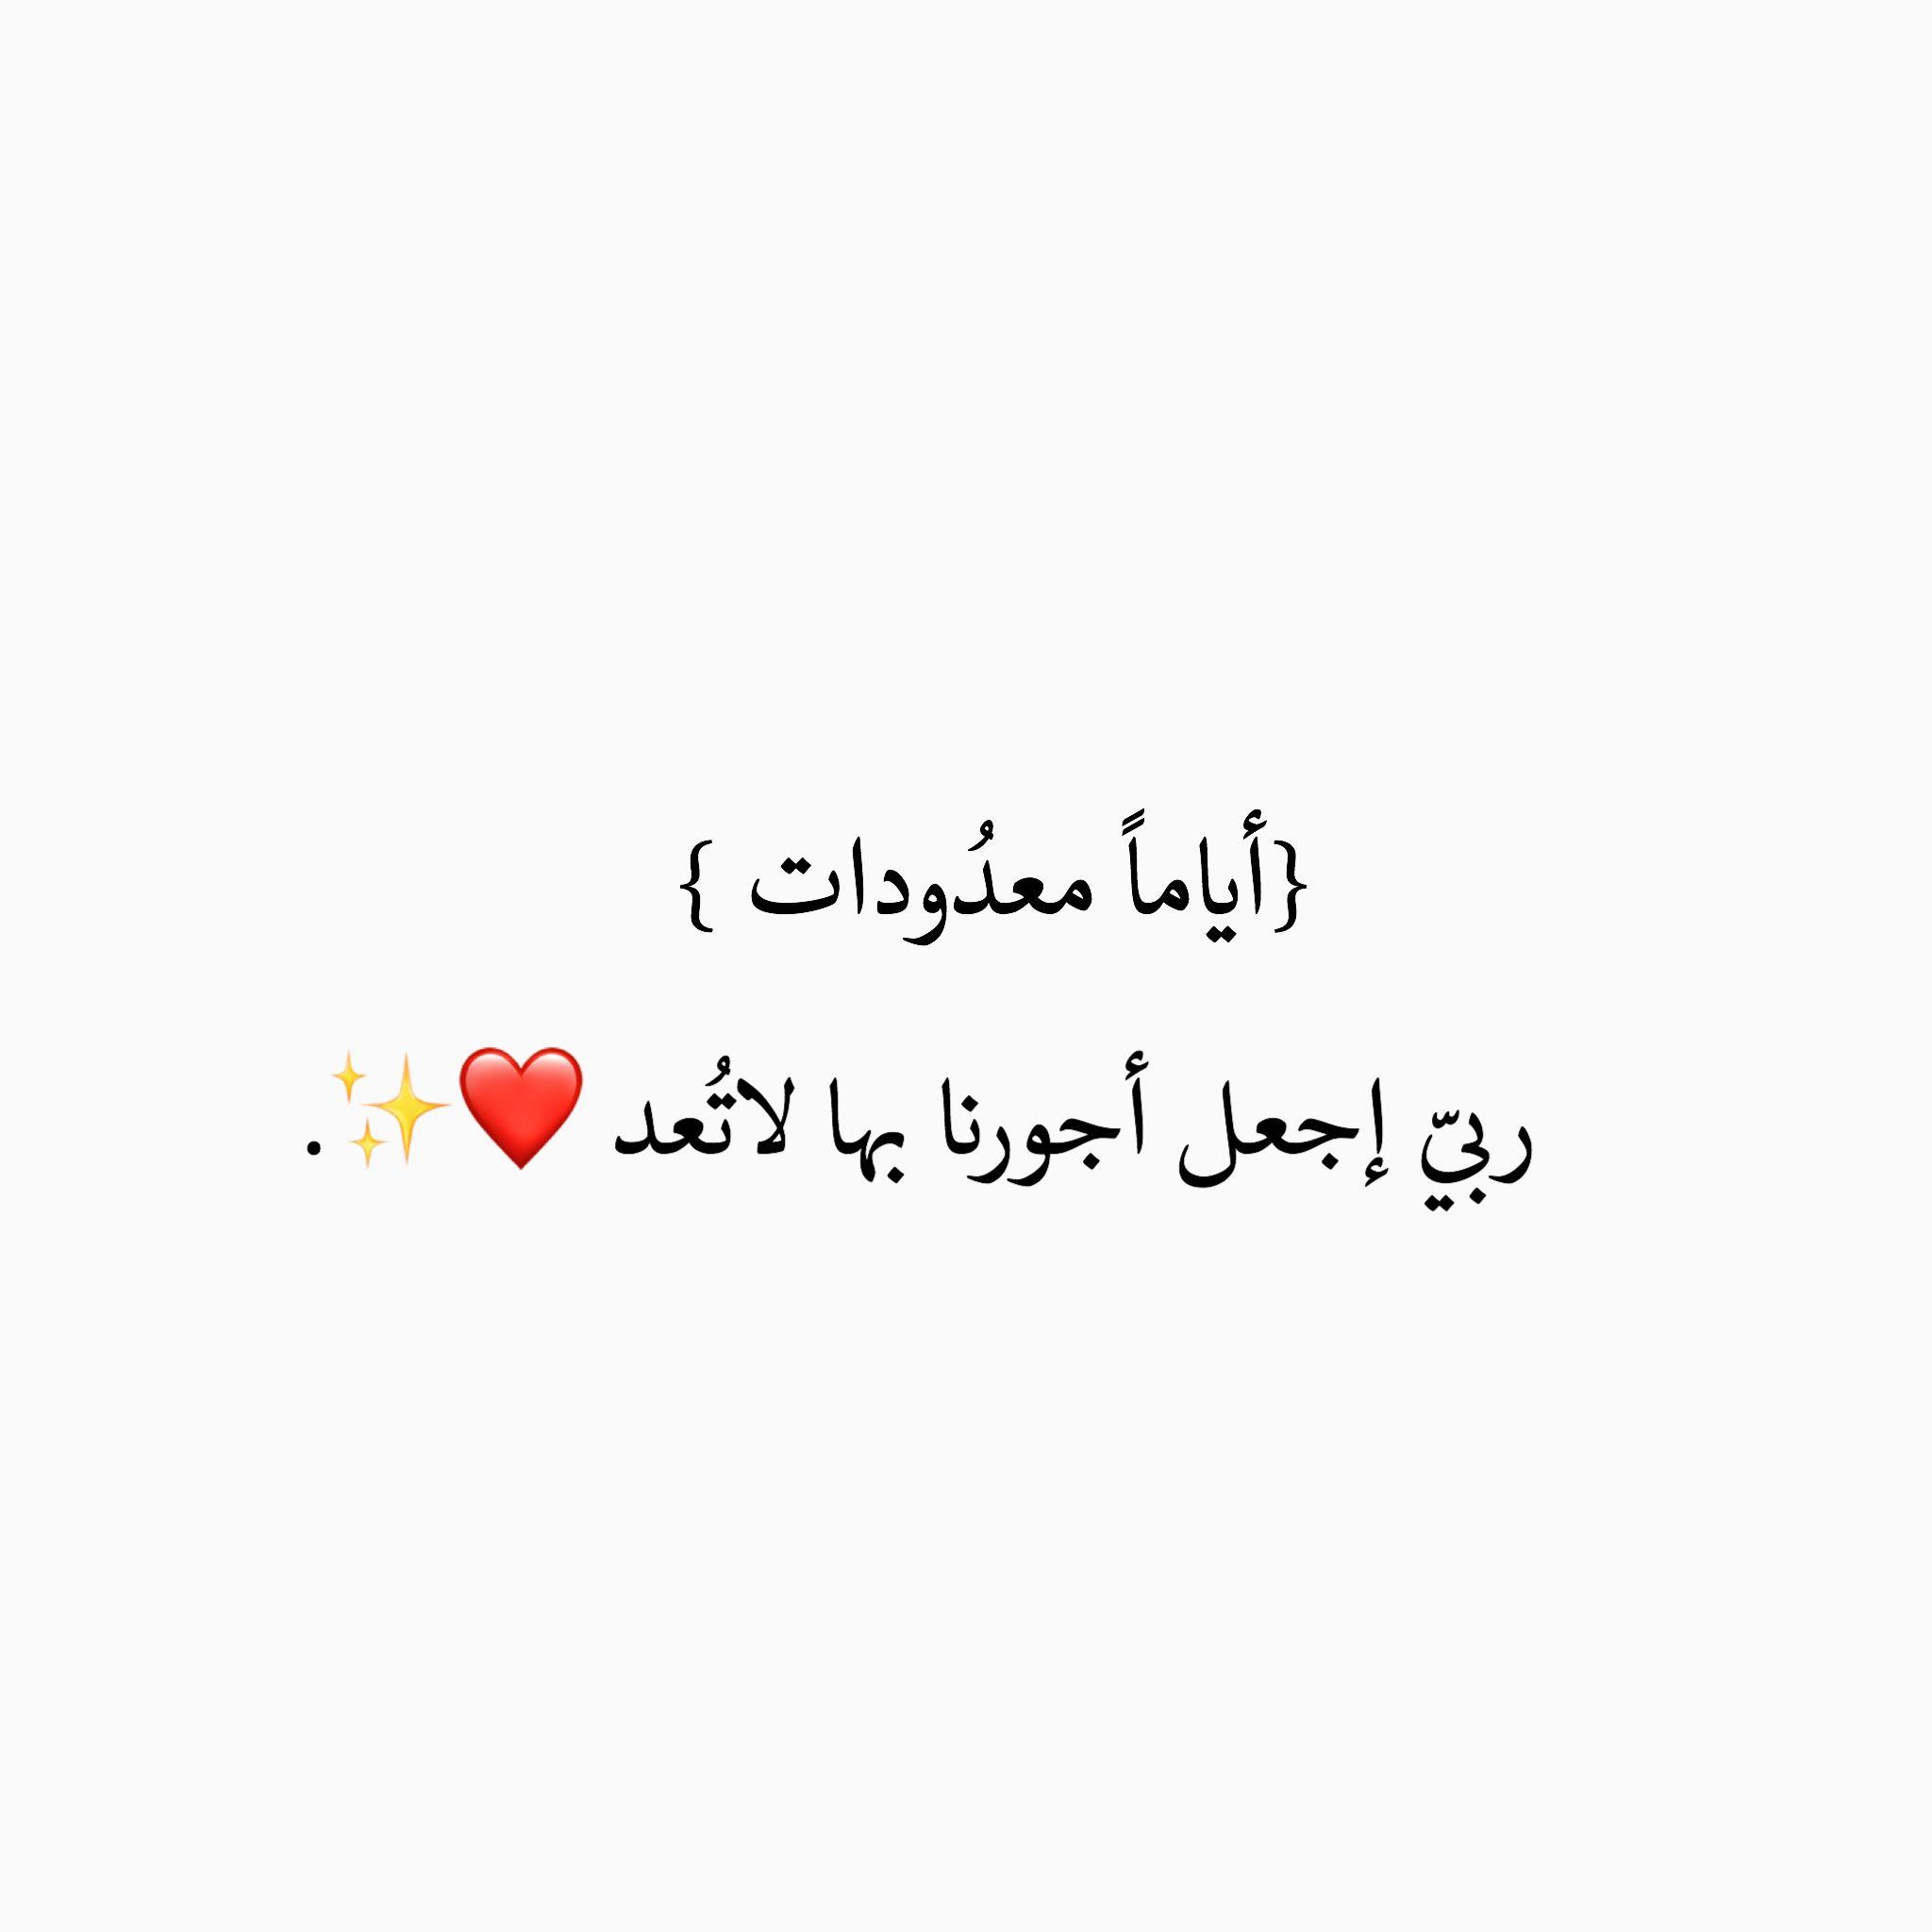 Pin By White Paperr1 On أدعية و أذكار Islamic Quotes Ramadan Day Beautiful Arabic Words